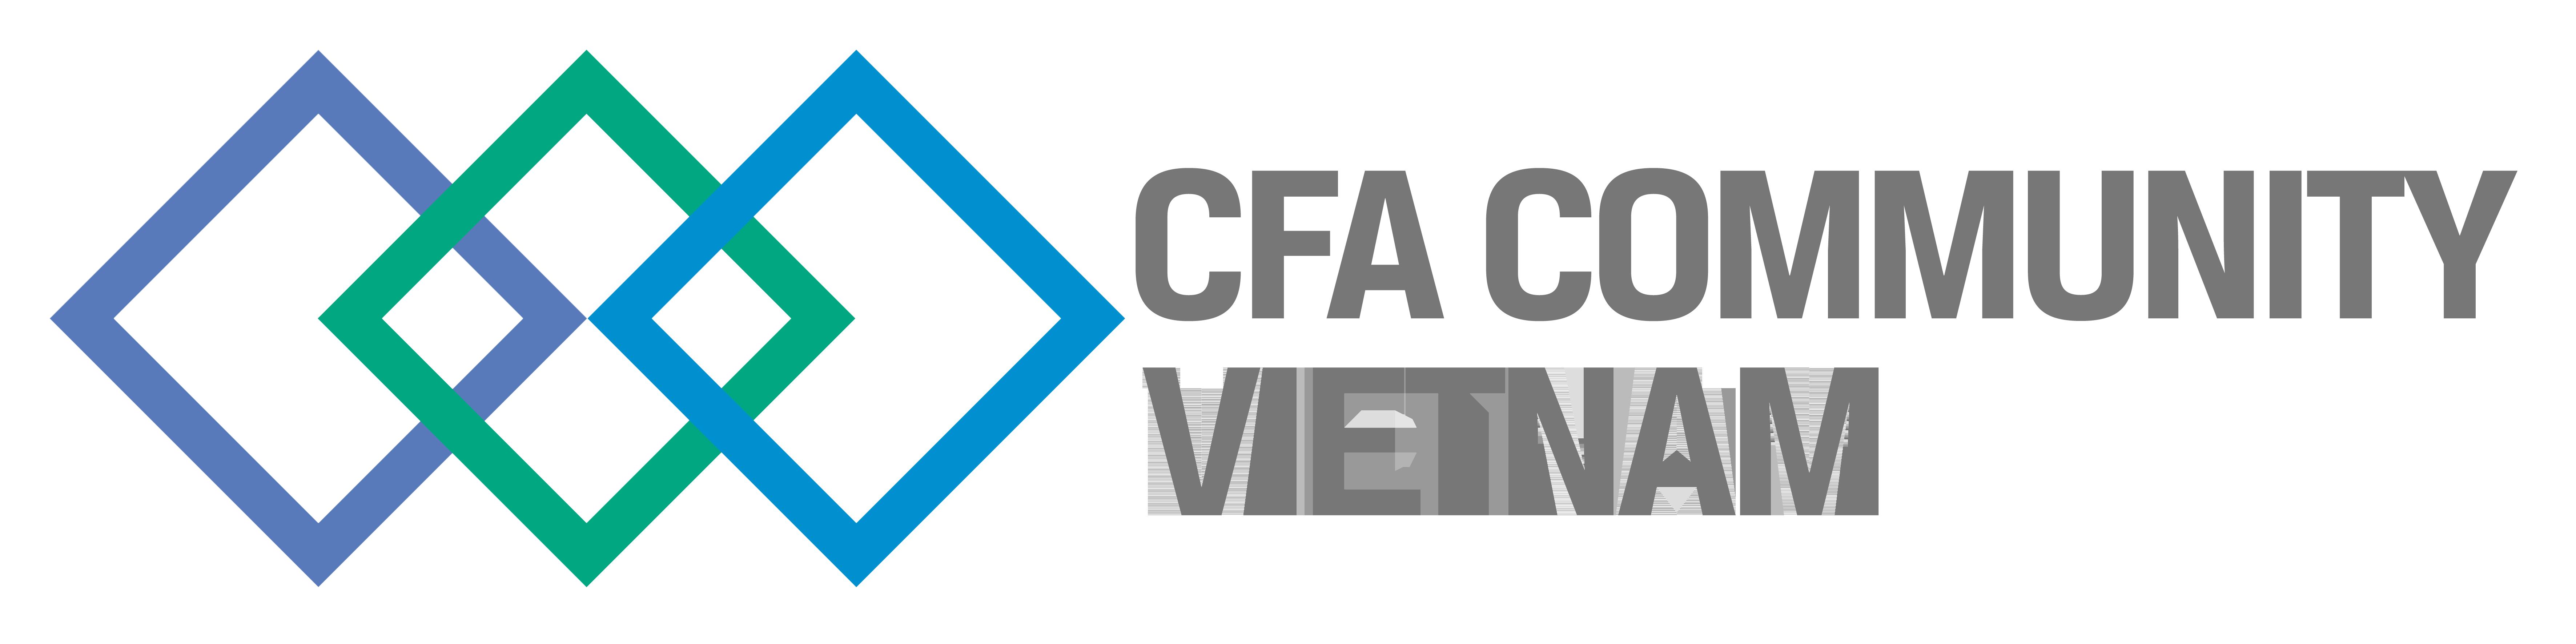 CFA Community Vietnam